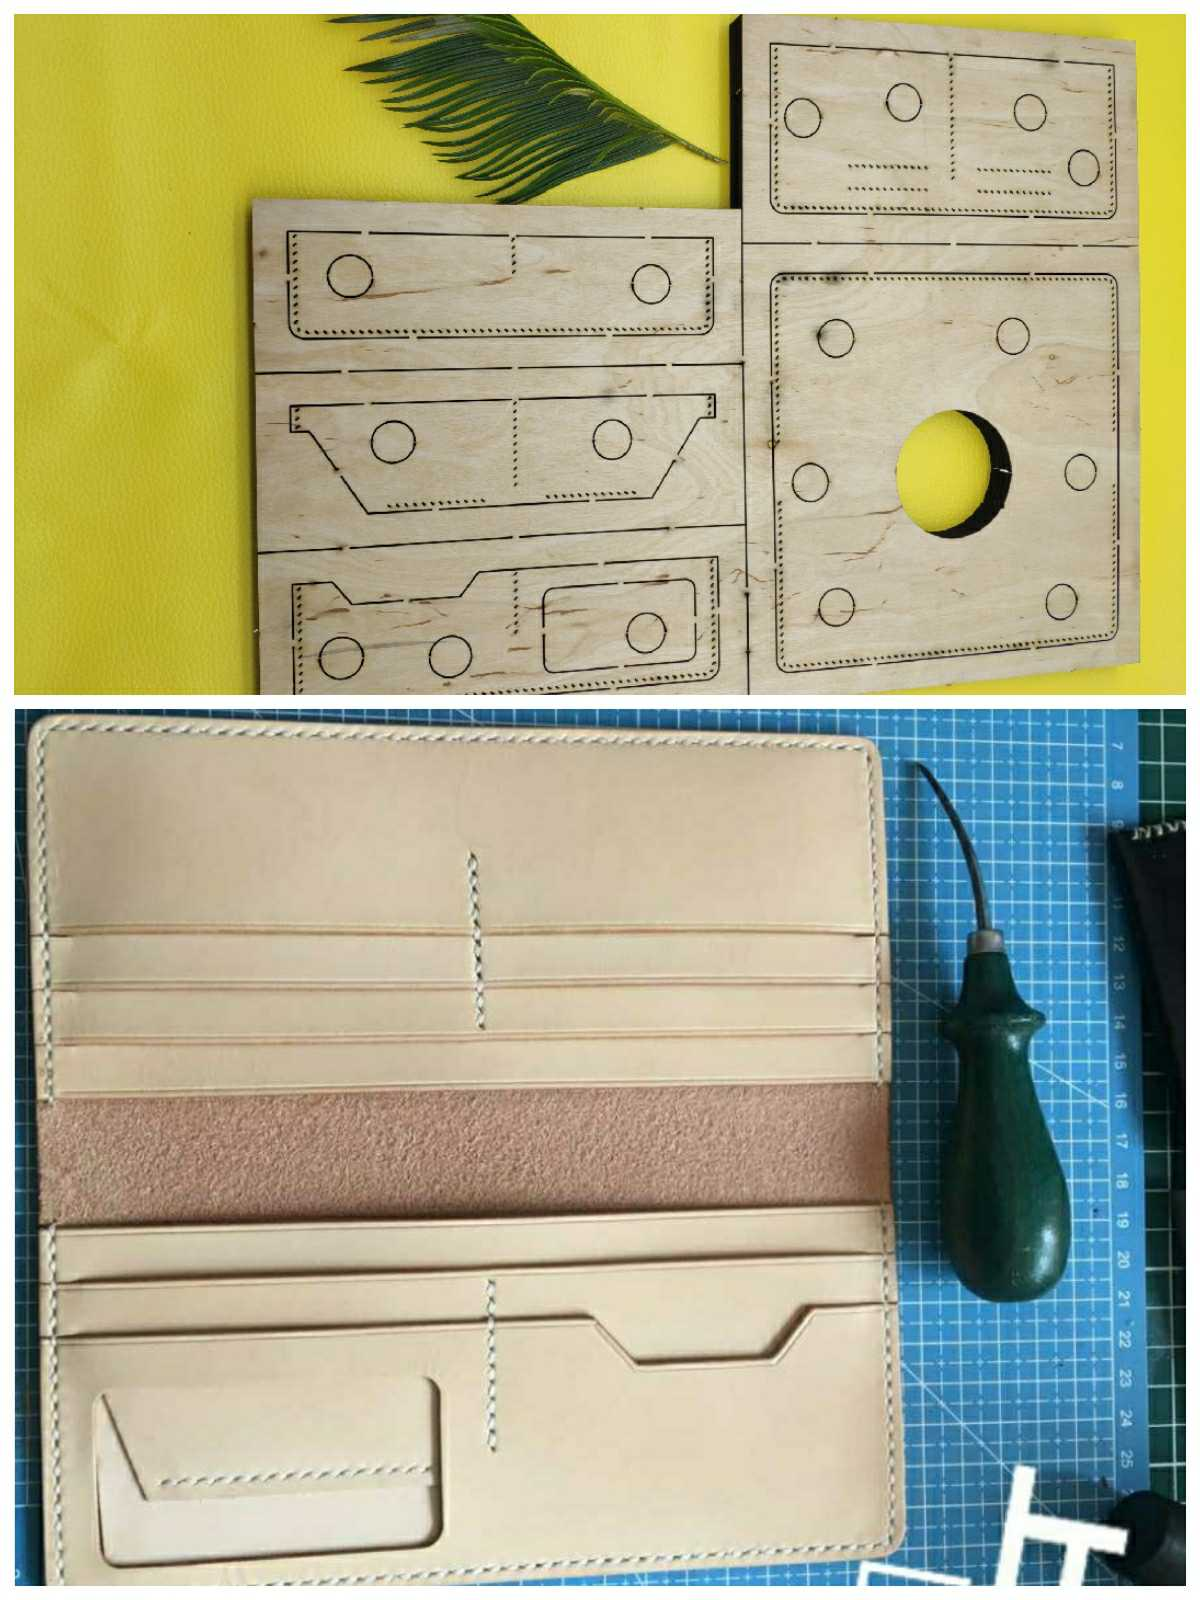 Japan Steel Blade Rule Die Cut Steel Punch Wallet Cutting Mold Wood Dies for Leather Cutter